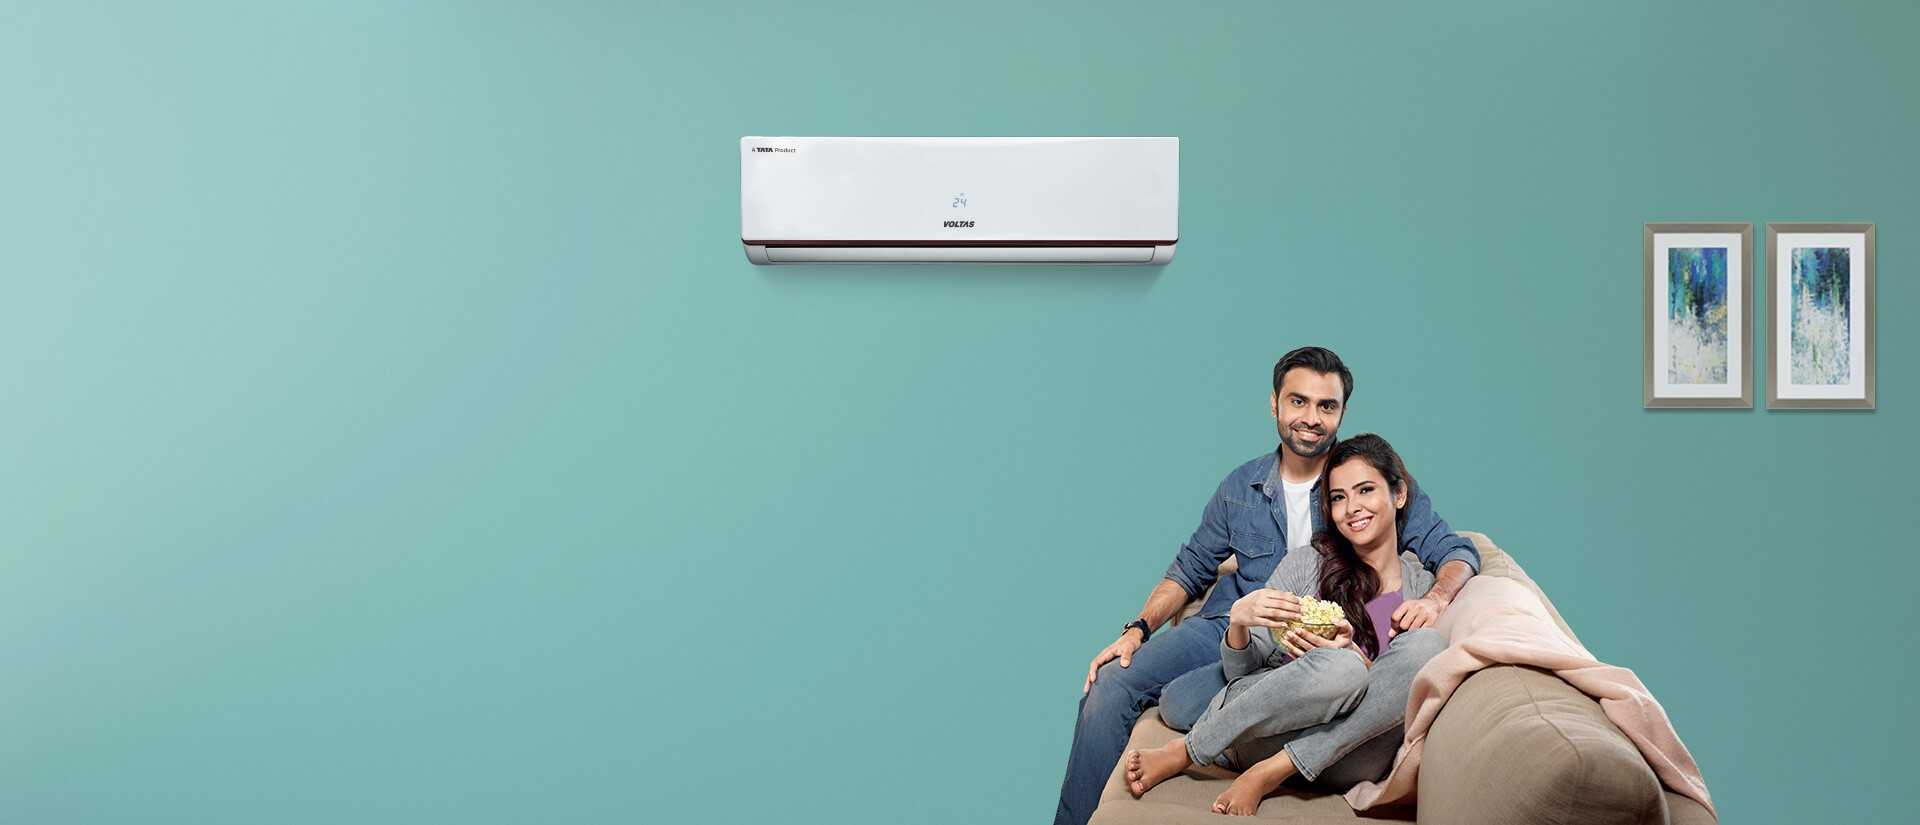 Snowtech air conditioning (@snowtechgurgaon) Cover Image